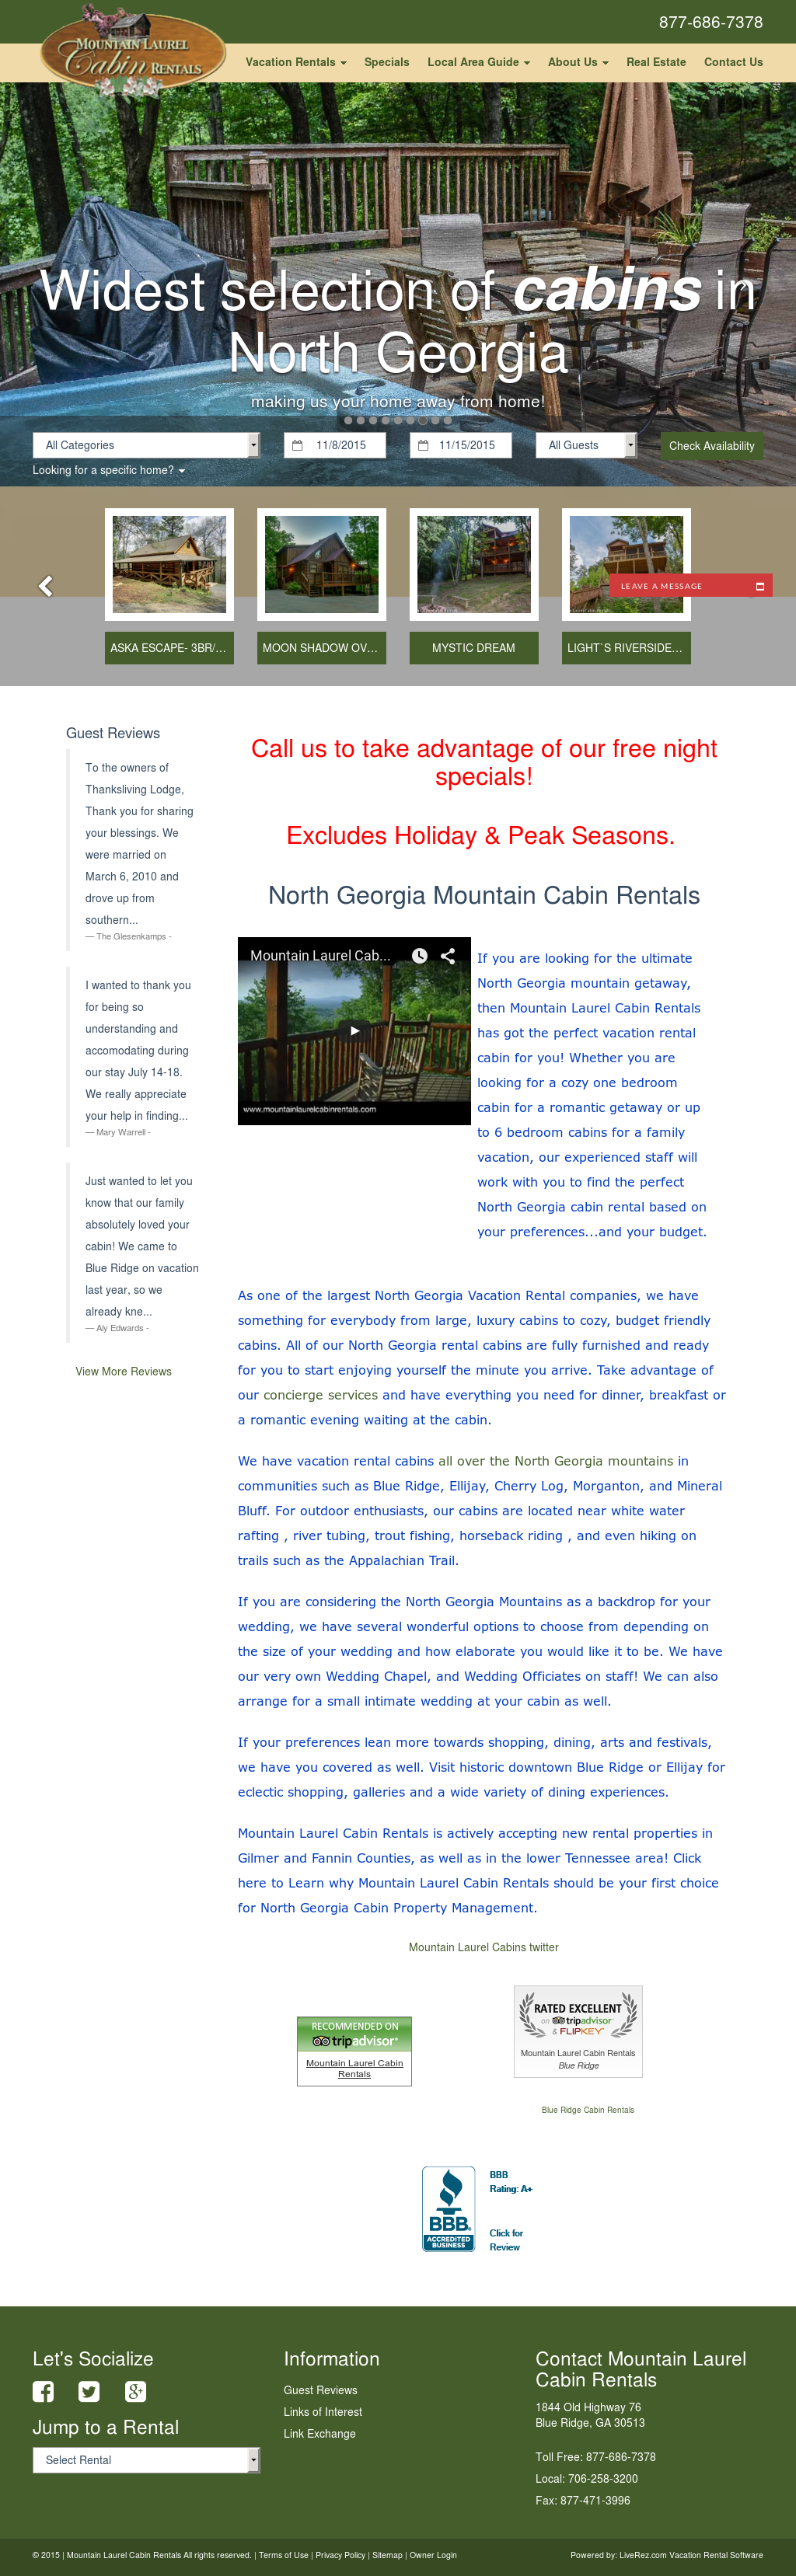 Mountain Laurel Cabin Rentals Competitors, Revenue and